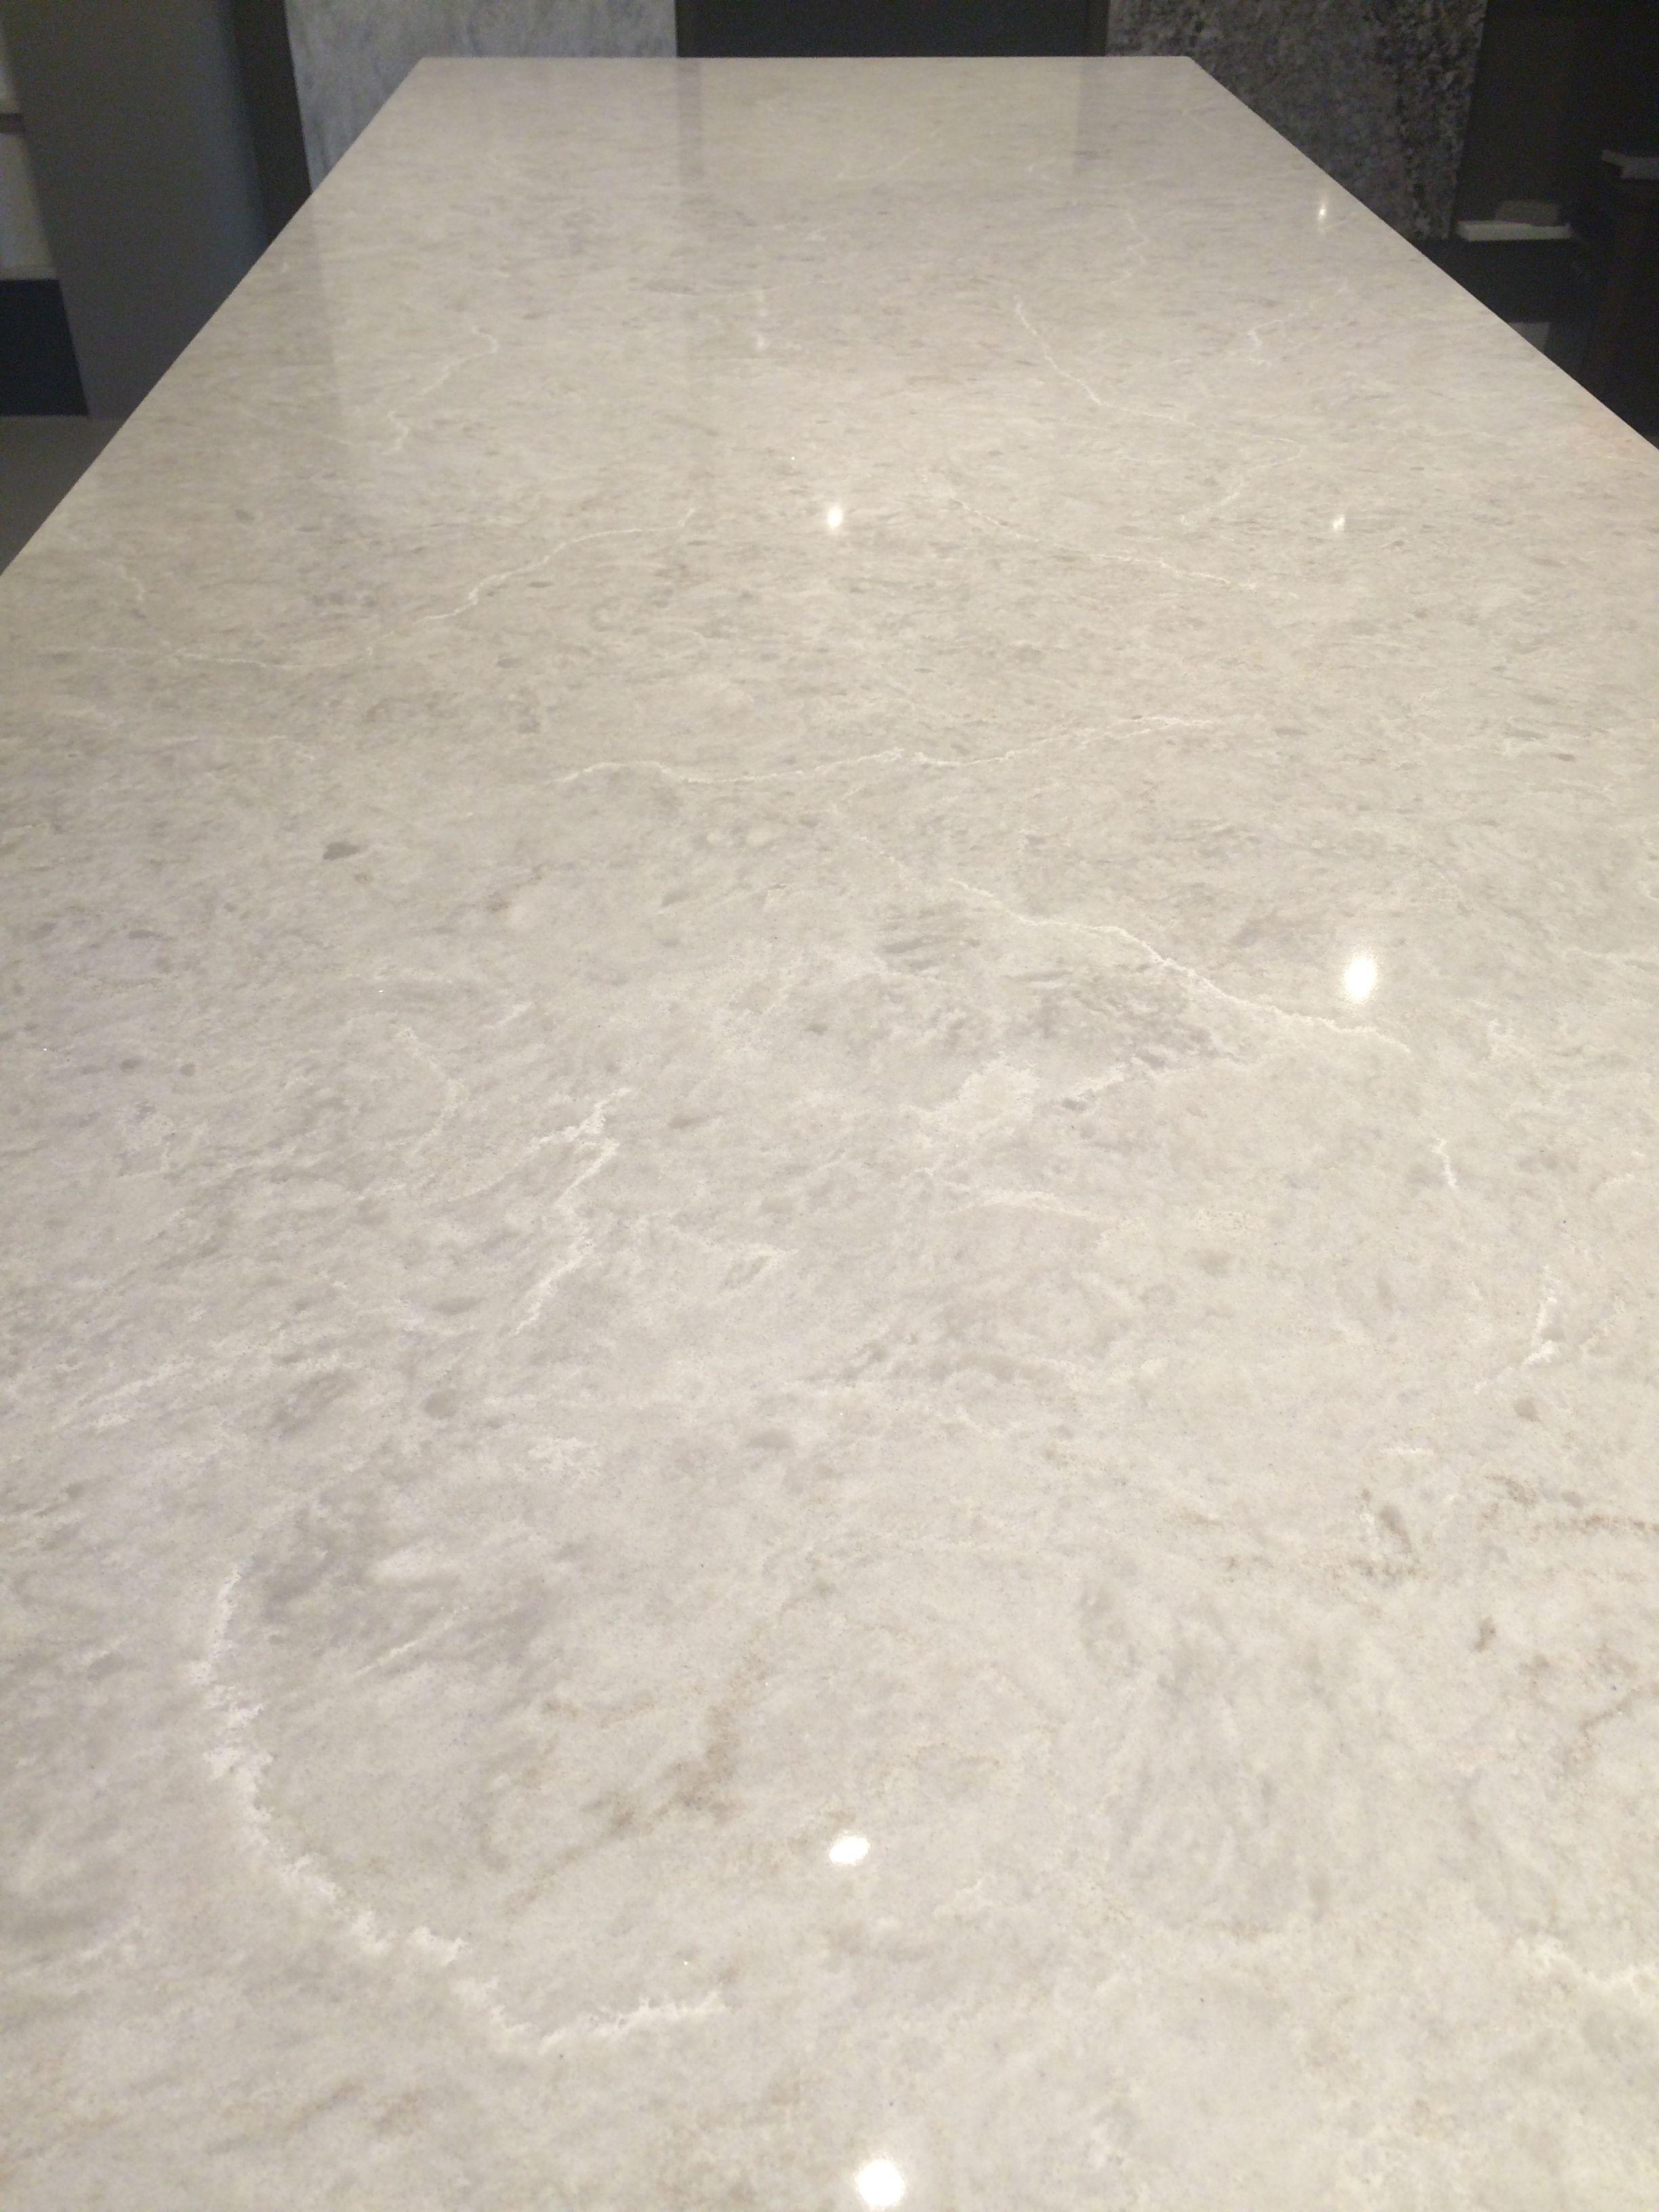 Caesarstone Quartz Bianco Drift 6131 Replacing Kitchen